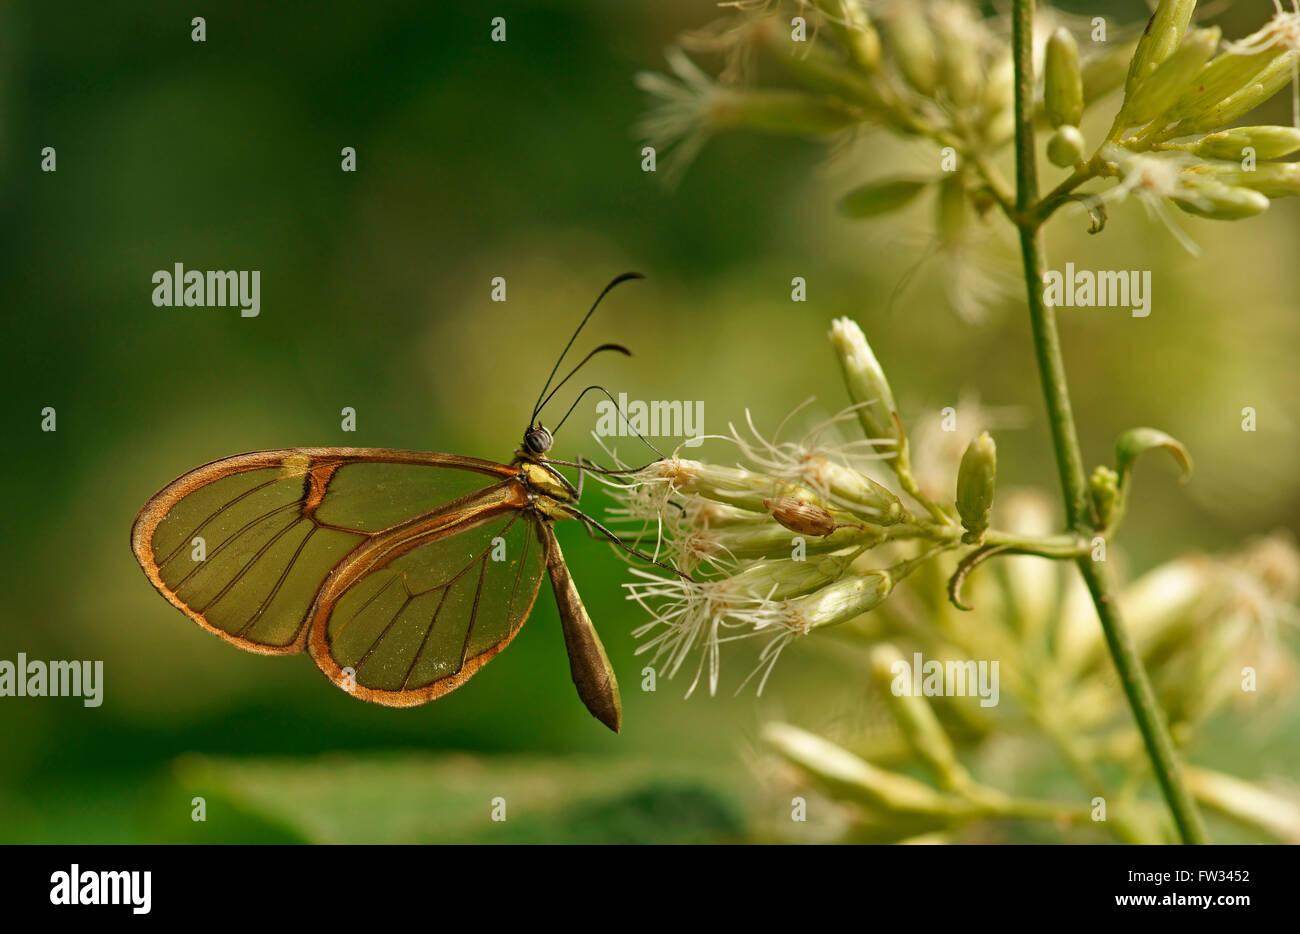 Clearwing, farfalle tropicali (Hypoleria lavinia), Iguazú National Park, Paraná, Brasile Immagini Stock